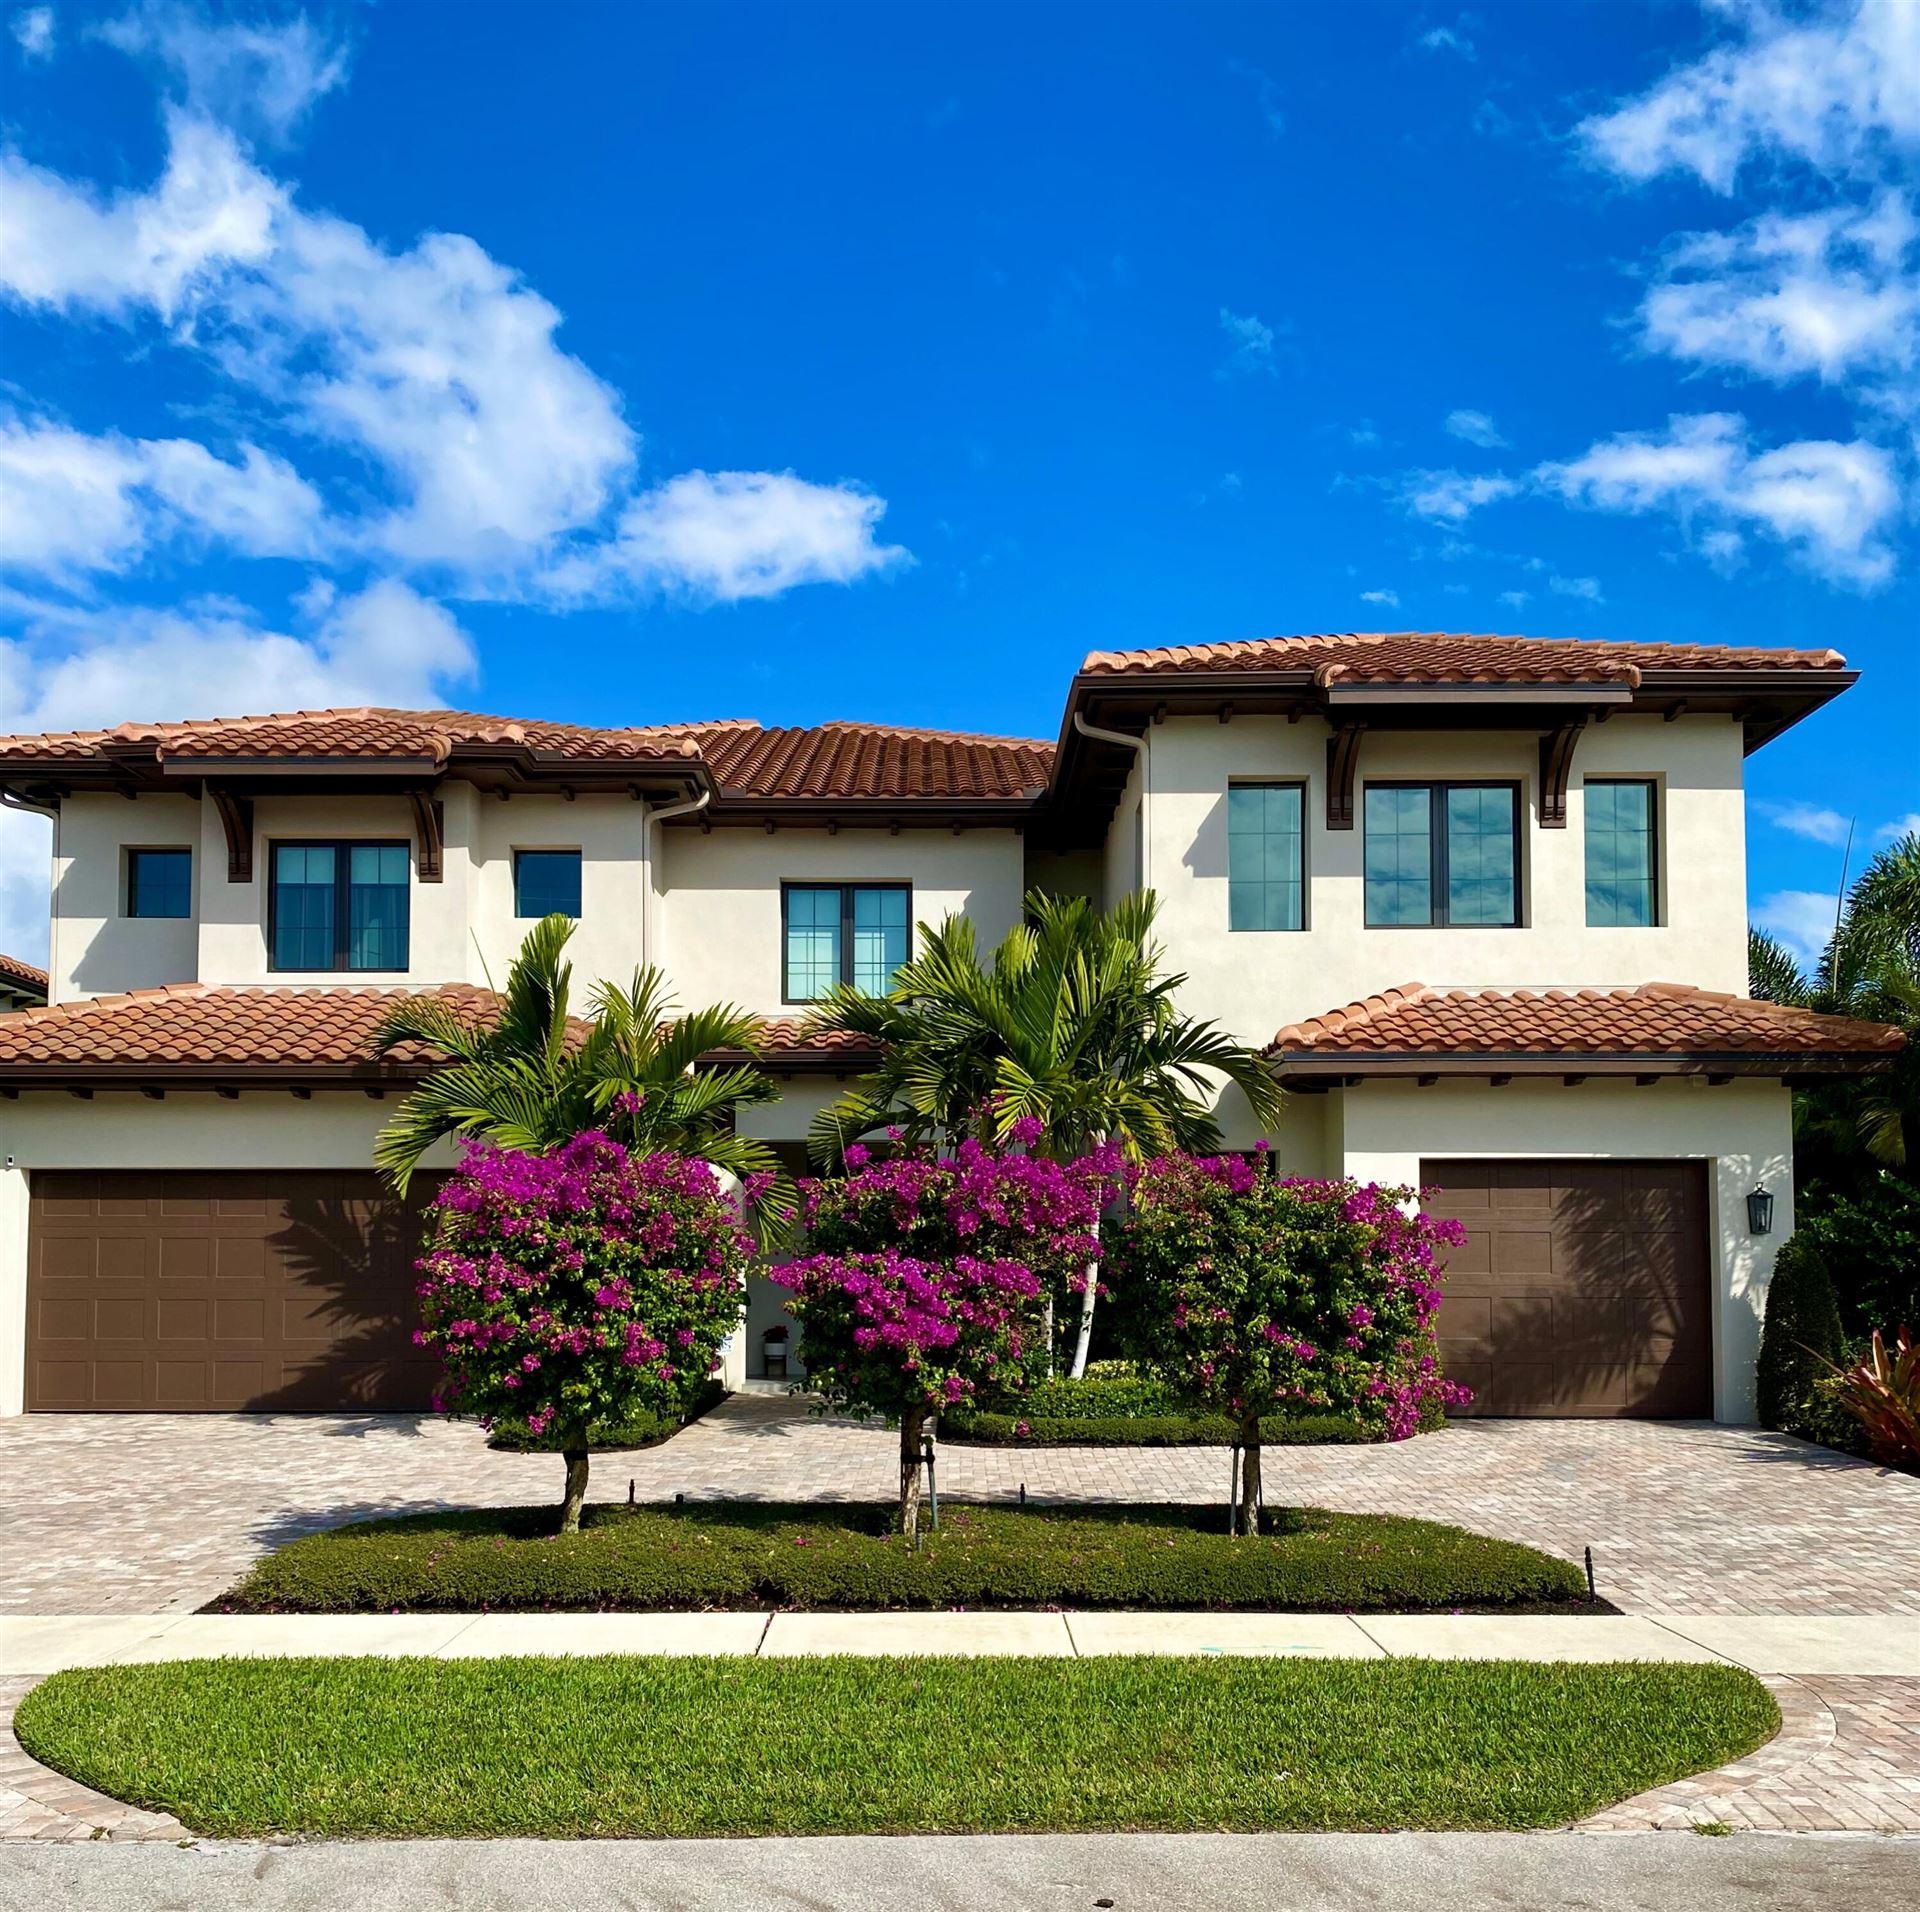 903 NW 2nd Street, Boca Raton, FL 33486 - #: RX-10692904